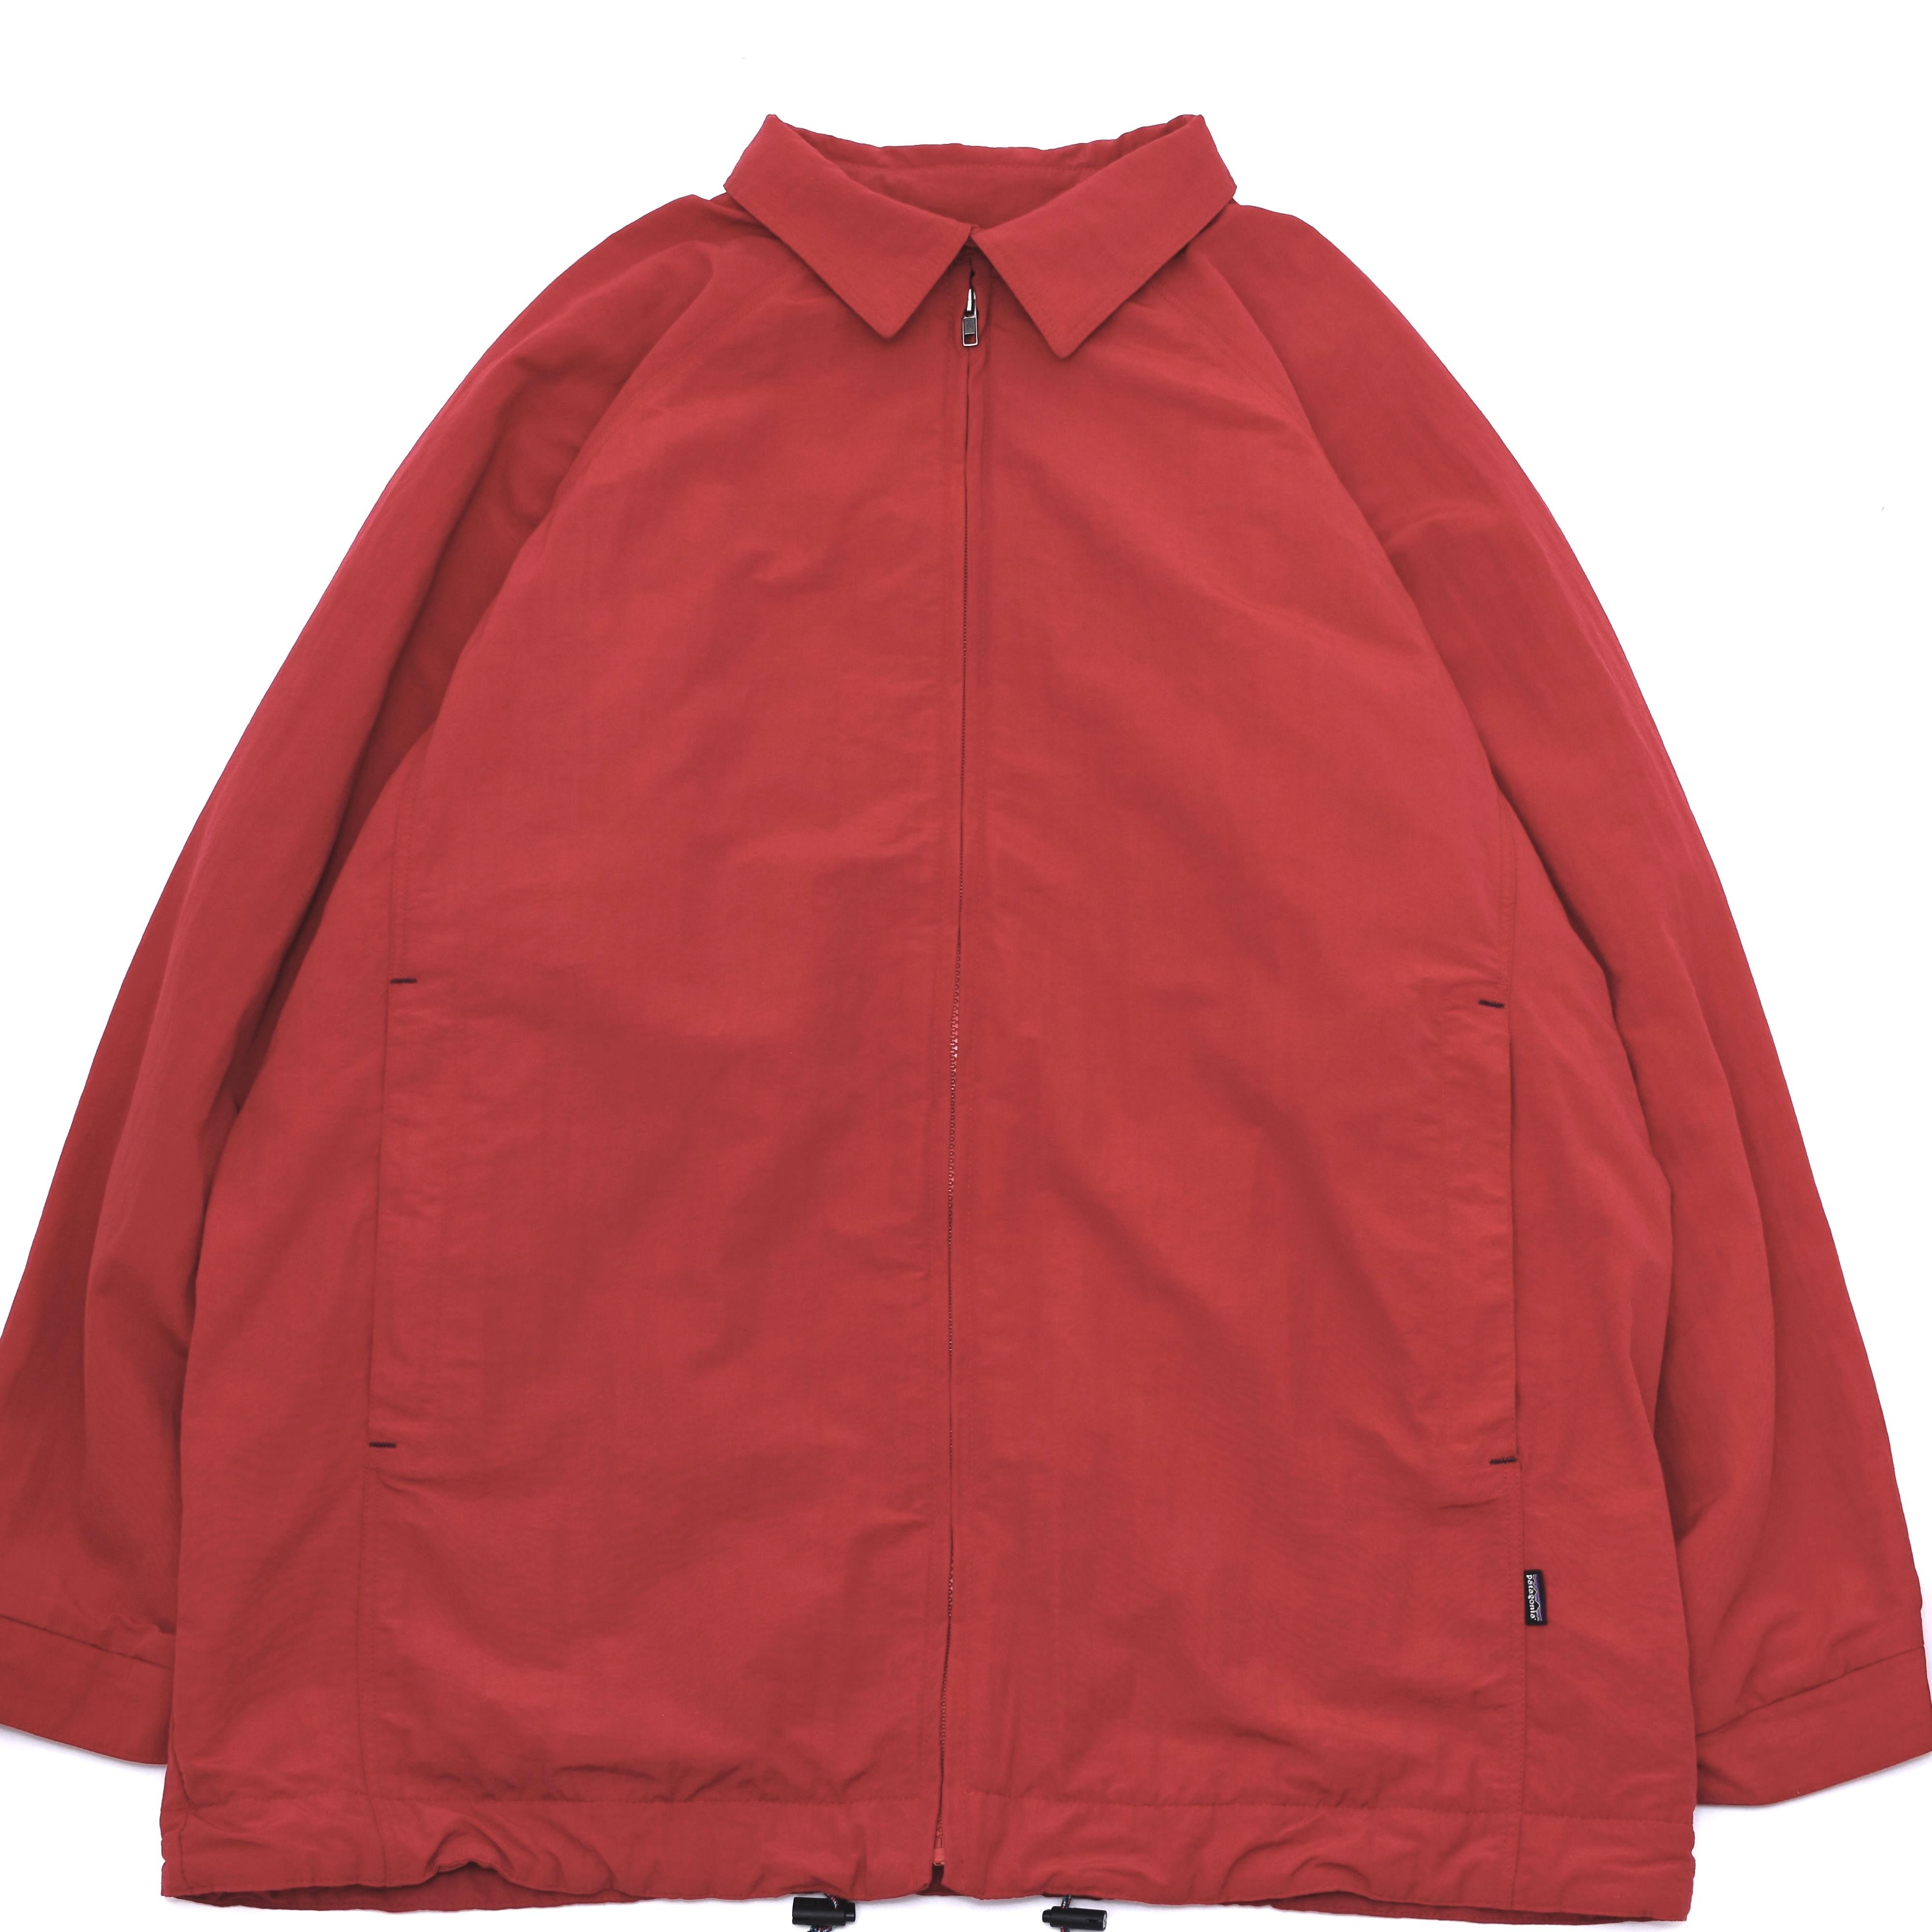 patagonia F5 shelled synchilla jacket